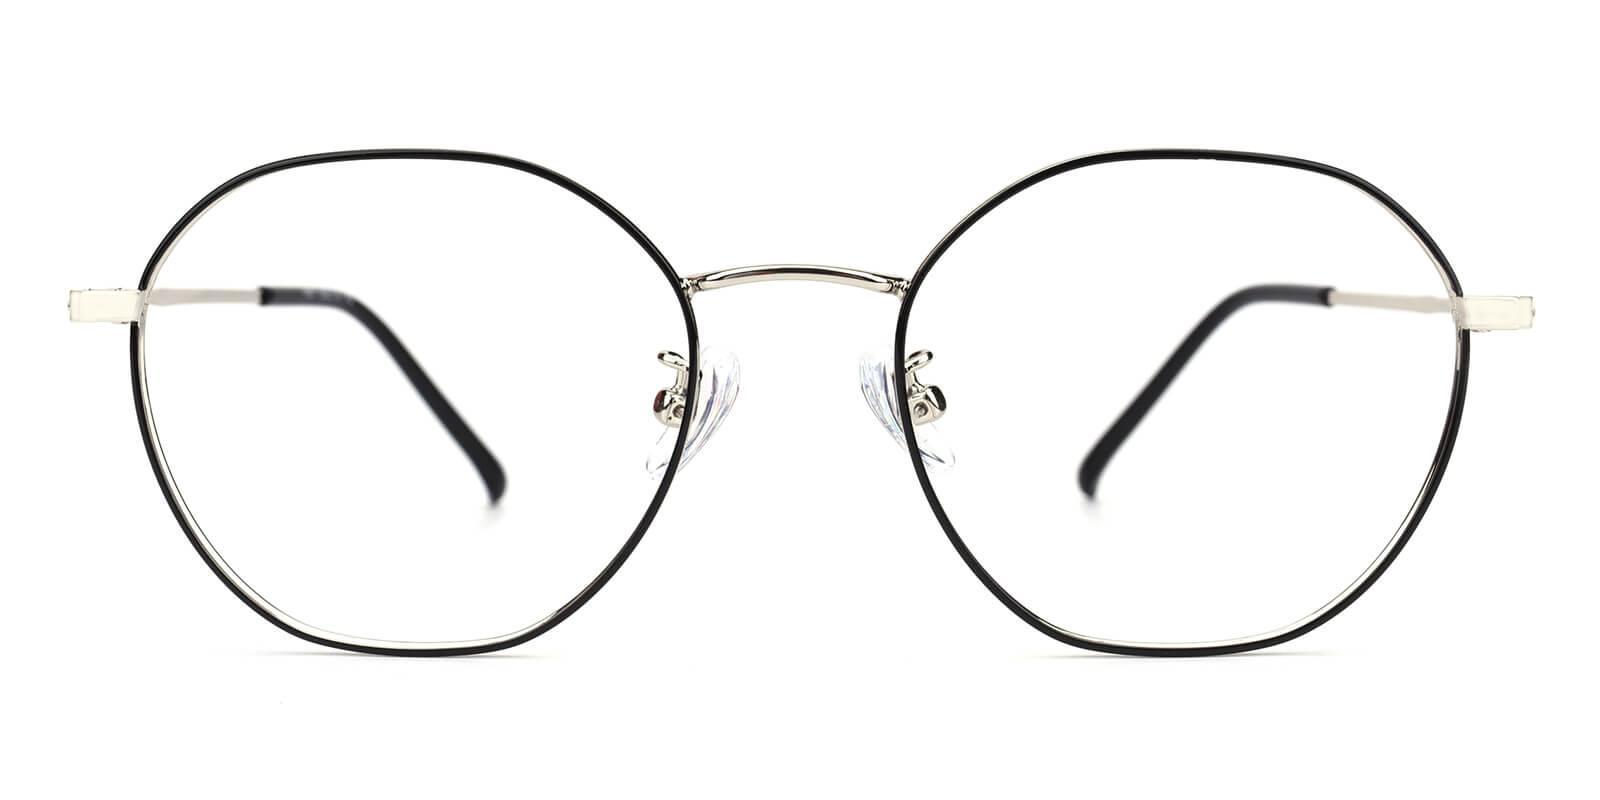 Govind-Black-Round-Metal-Eyeglasses-additional2